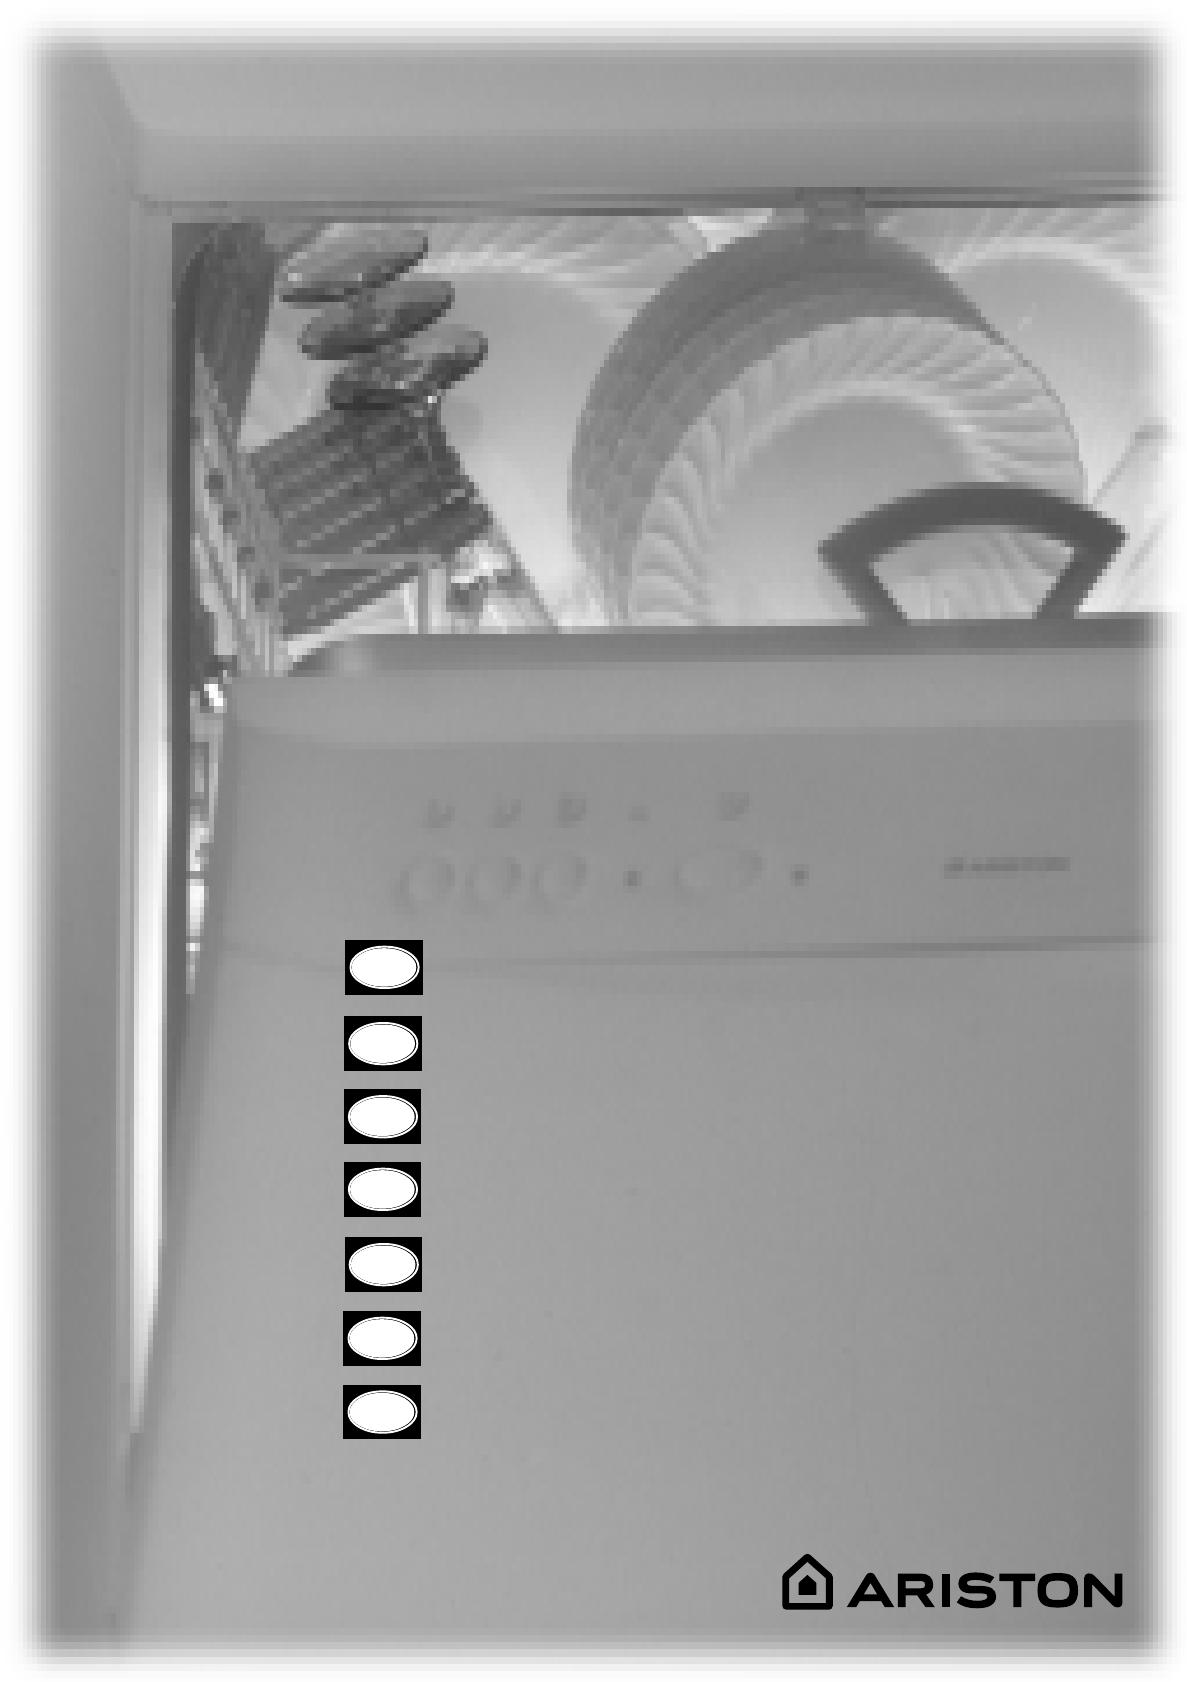 Hotpoint Ariston LI 67 DUO manuale